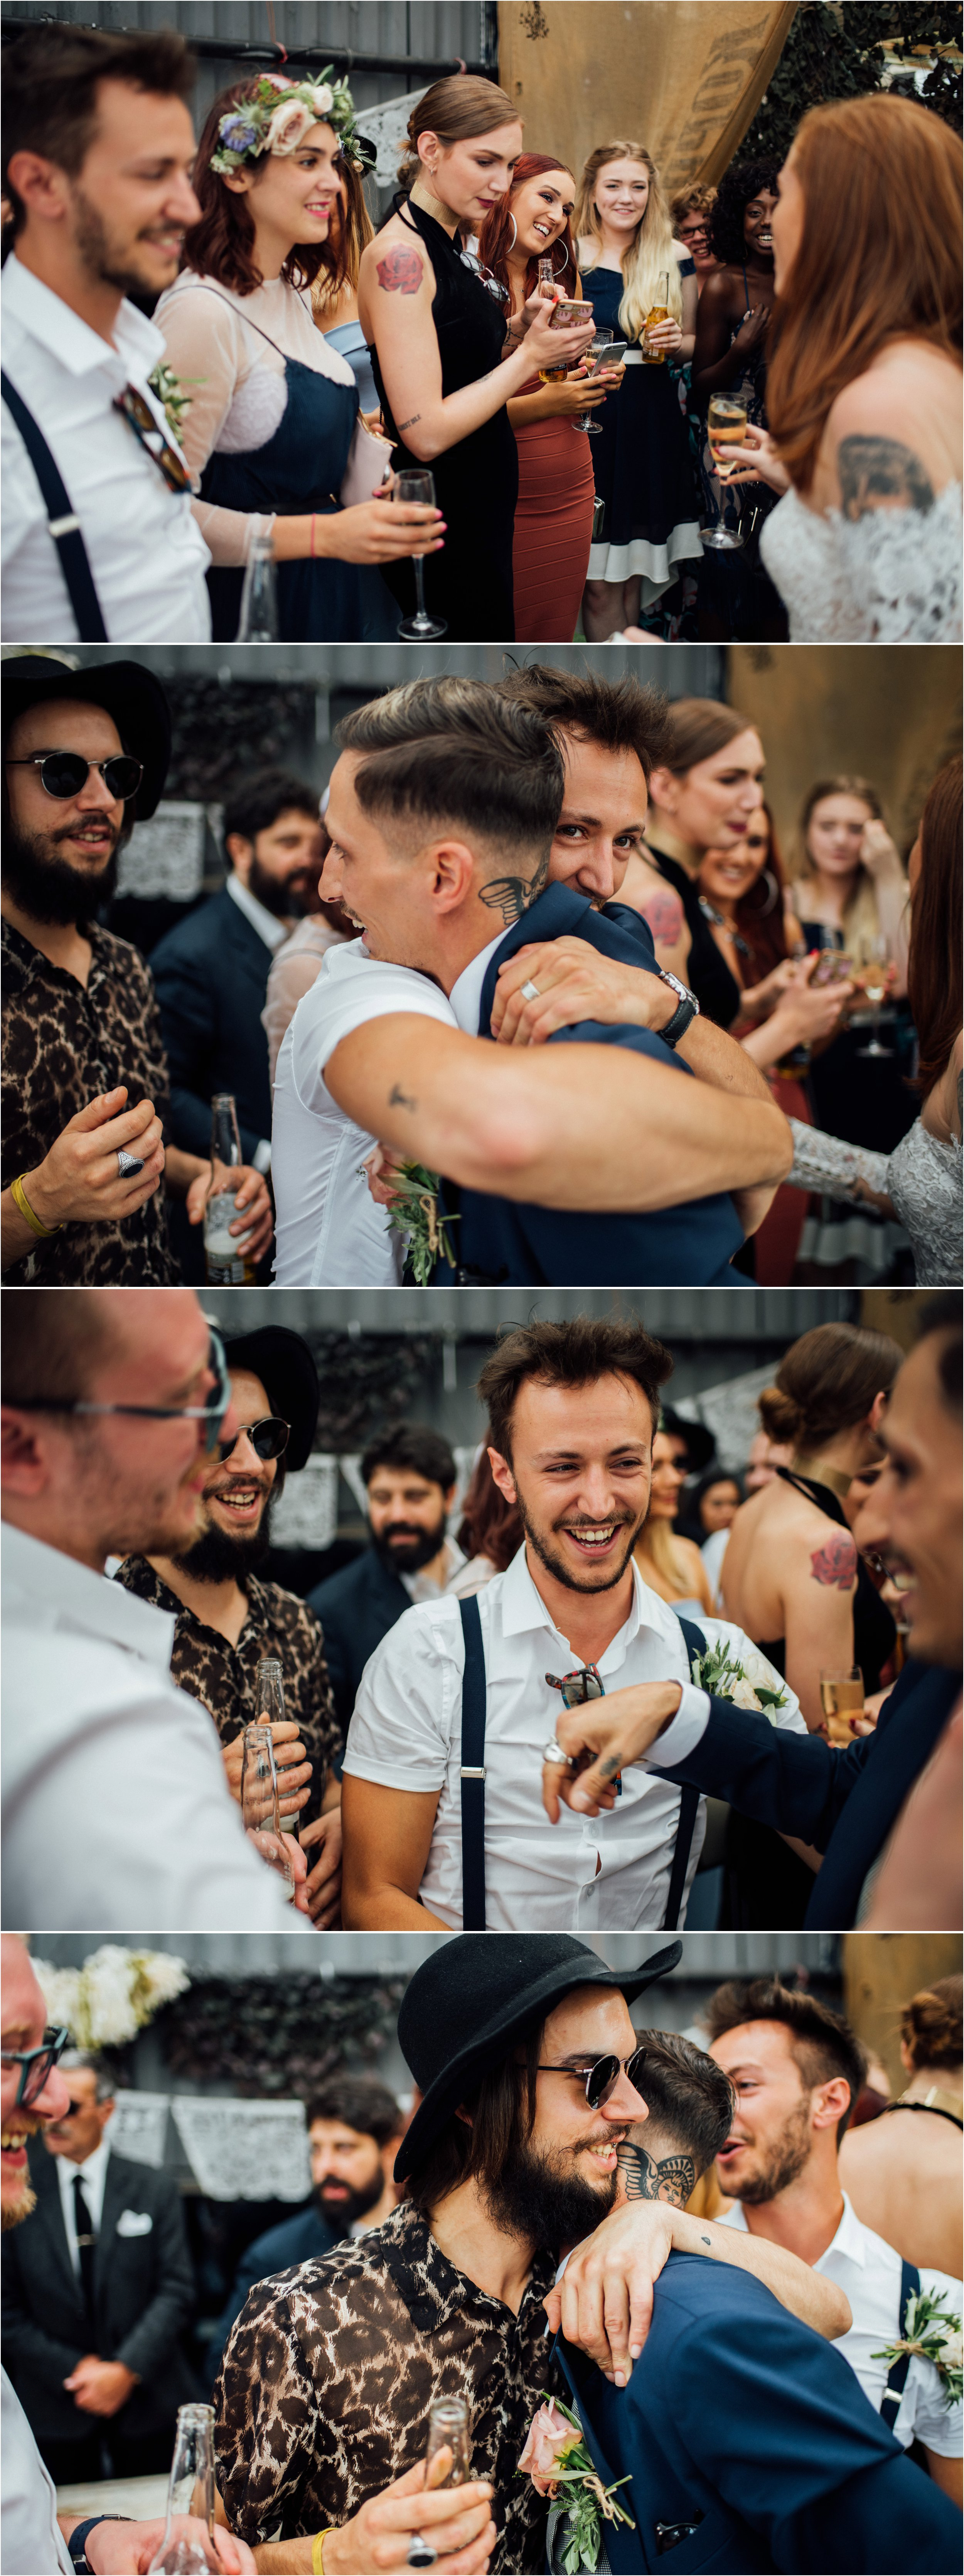 Hackney town hall wedding photography_0148.jpg